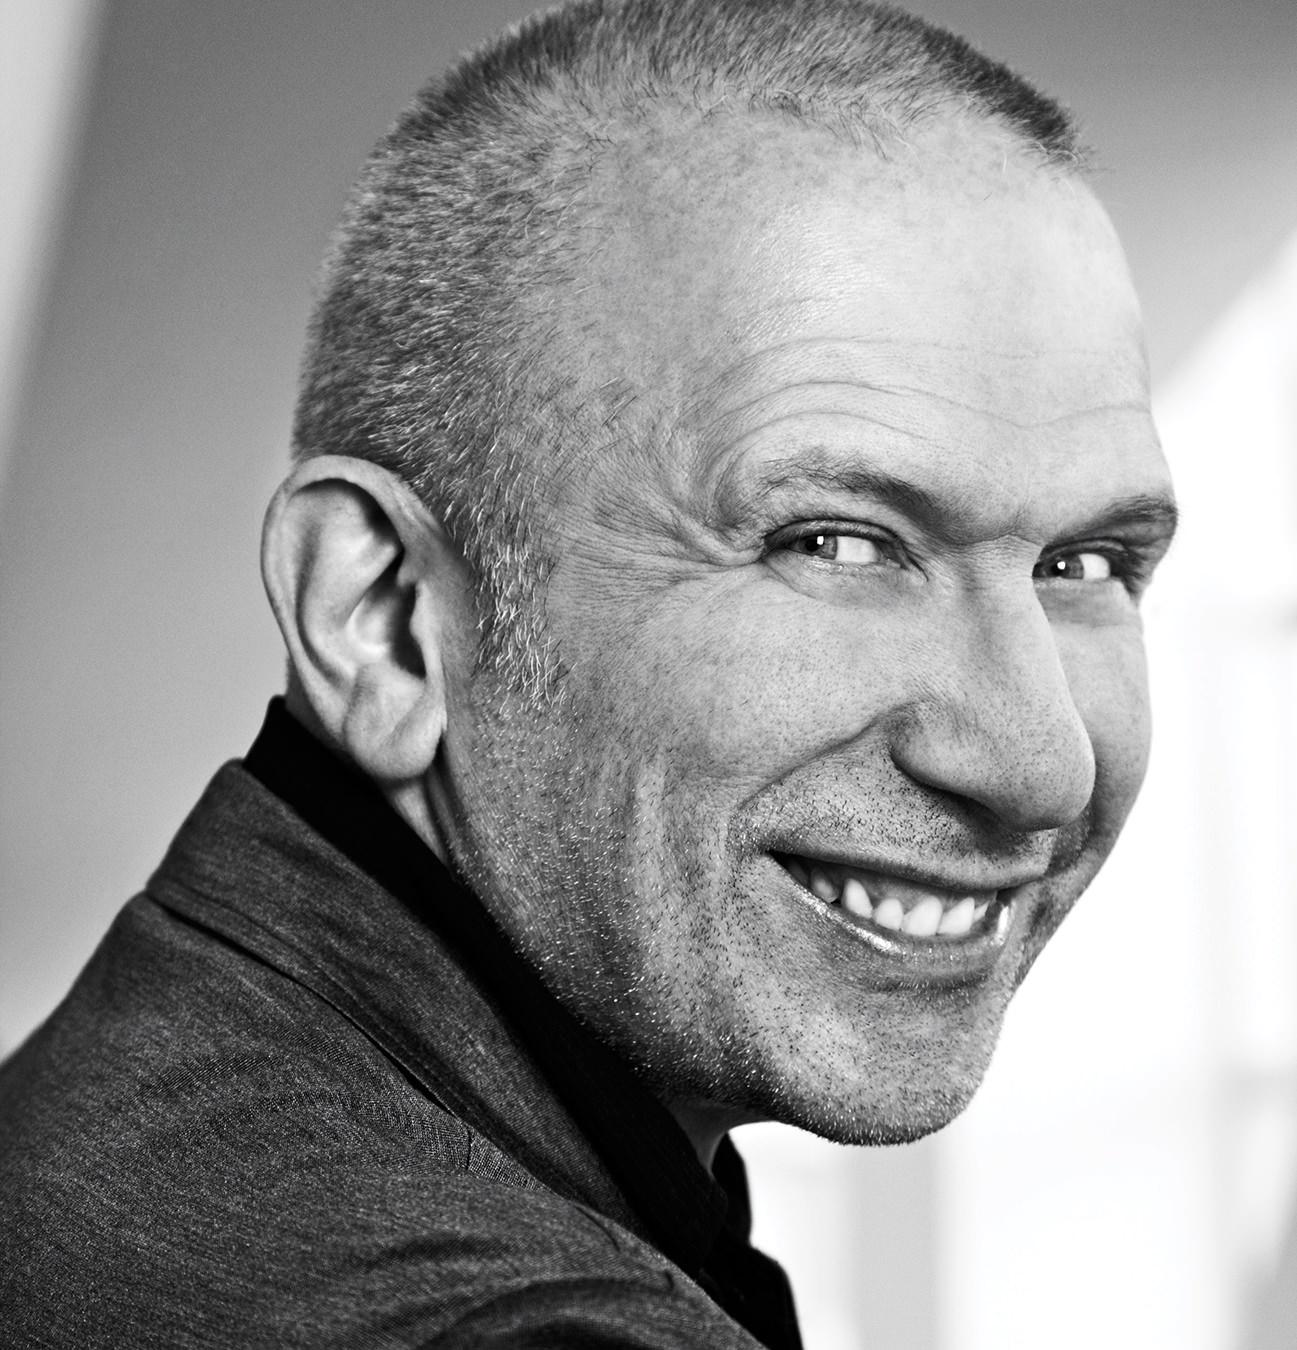 Pas 50 vitesh, dizajneri francez Jean Paul Gaultier i jep lamtumirën pasarelave